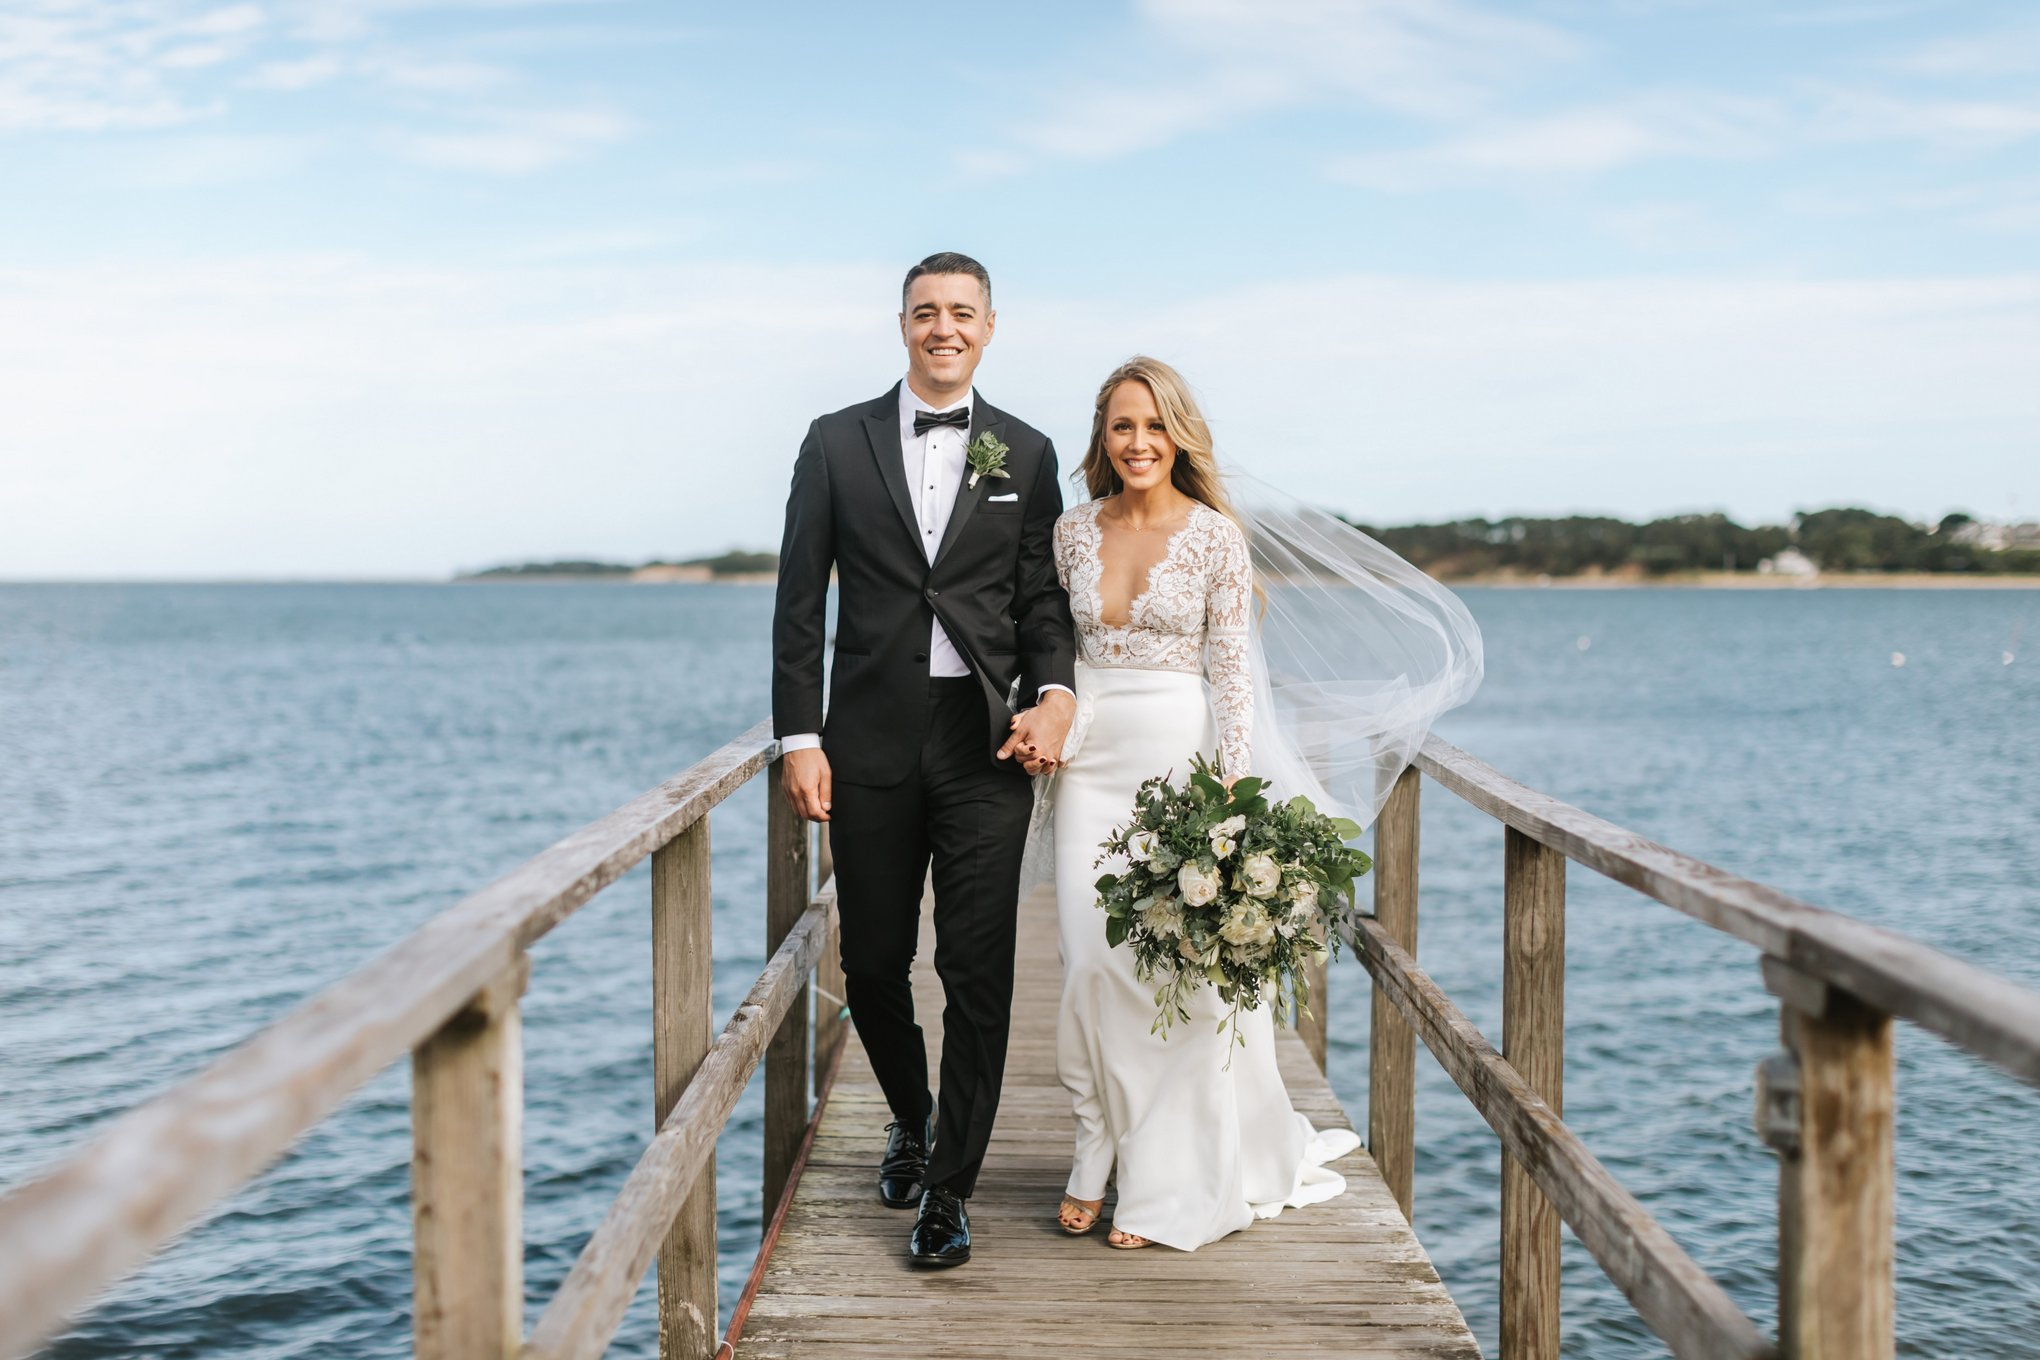 Wequassett-Wedding-Photographer-Cape-Cod-Boston-Lena-Mirisola-12.jpg